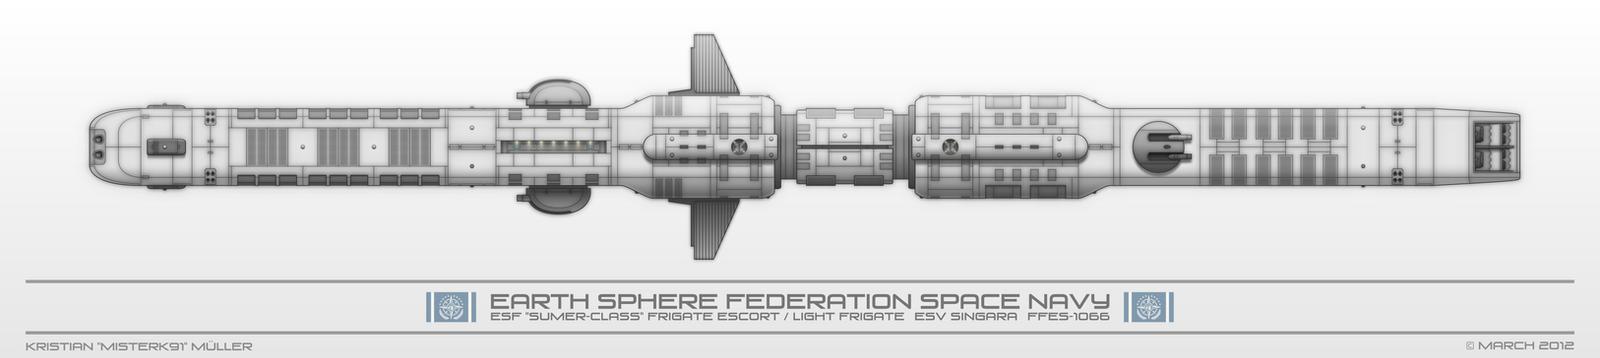 ESF SUMER-CLASS Frigate Escort / Light Frigate by MisterK91